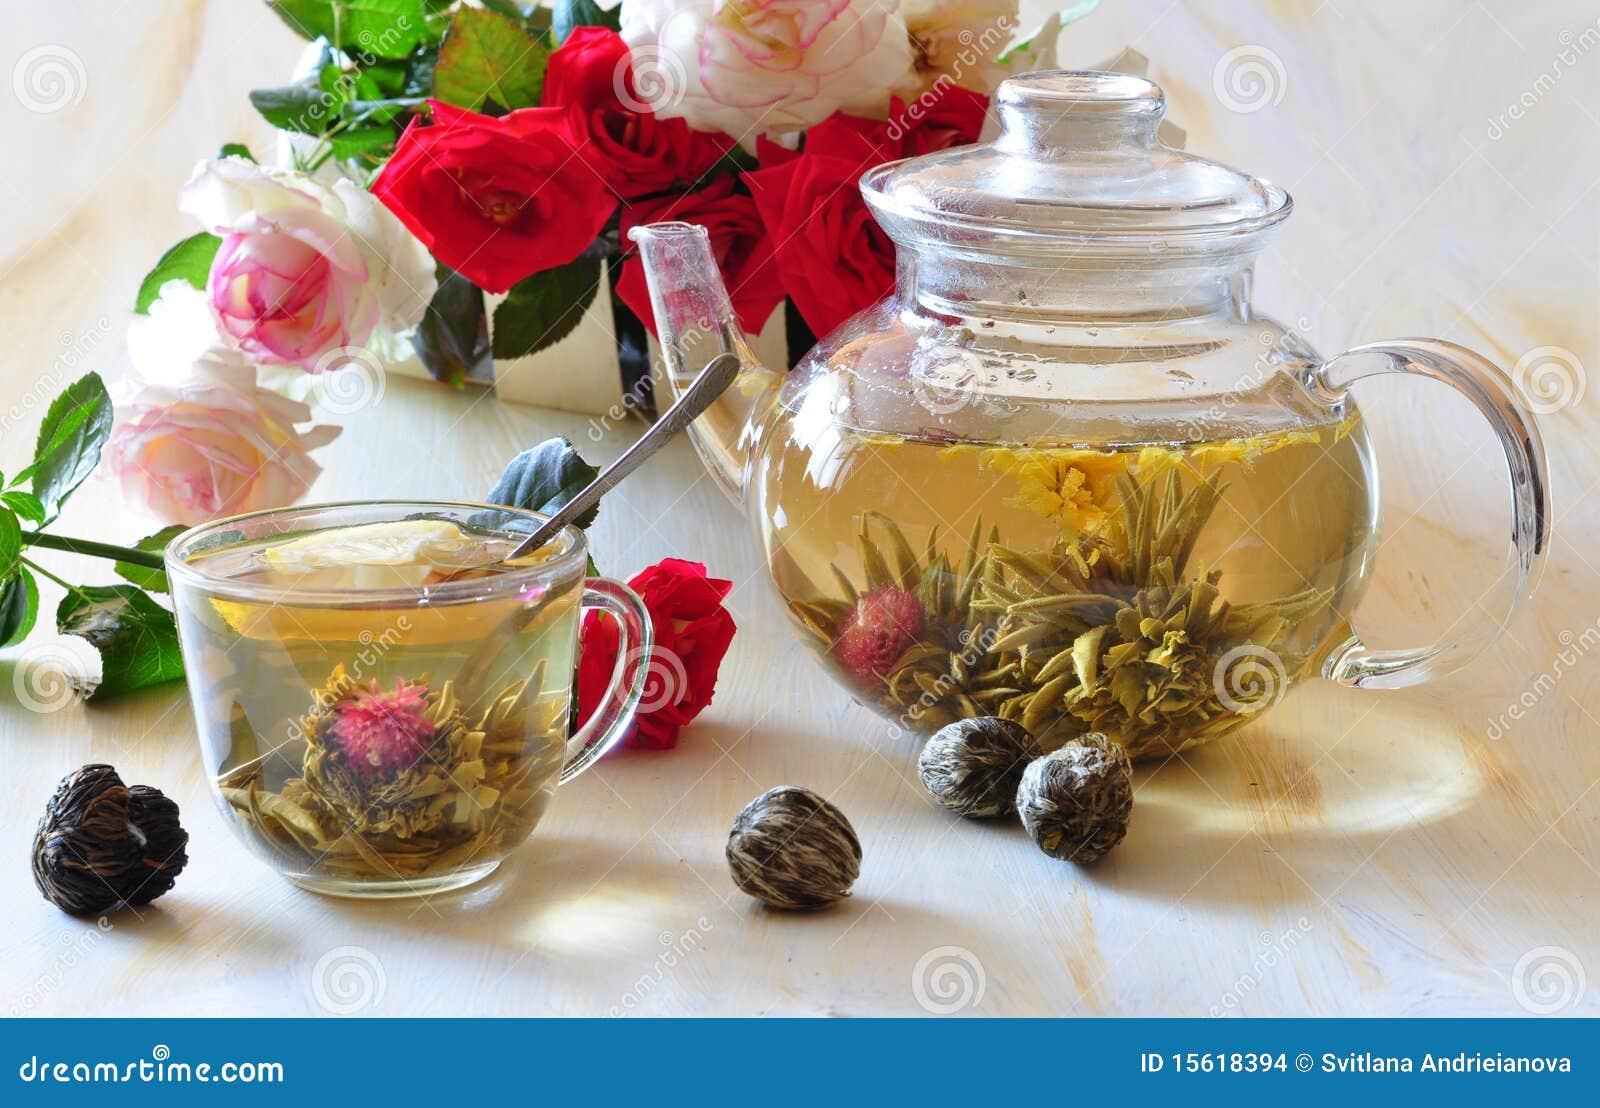 Green elite tea and roses